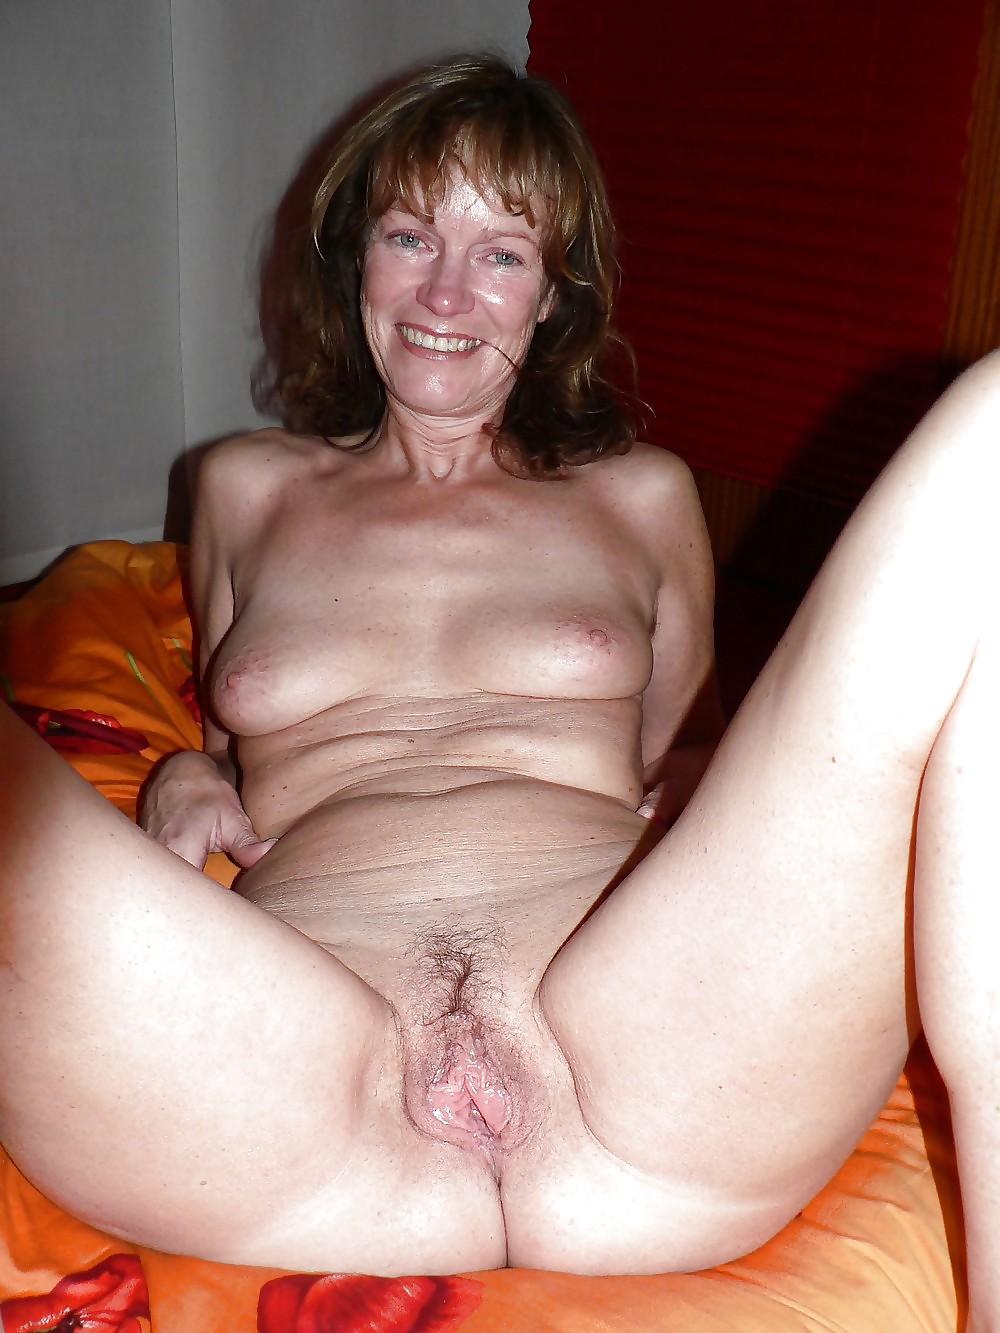 Tickling utube pantyhose stockings